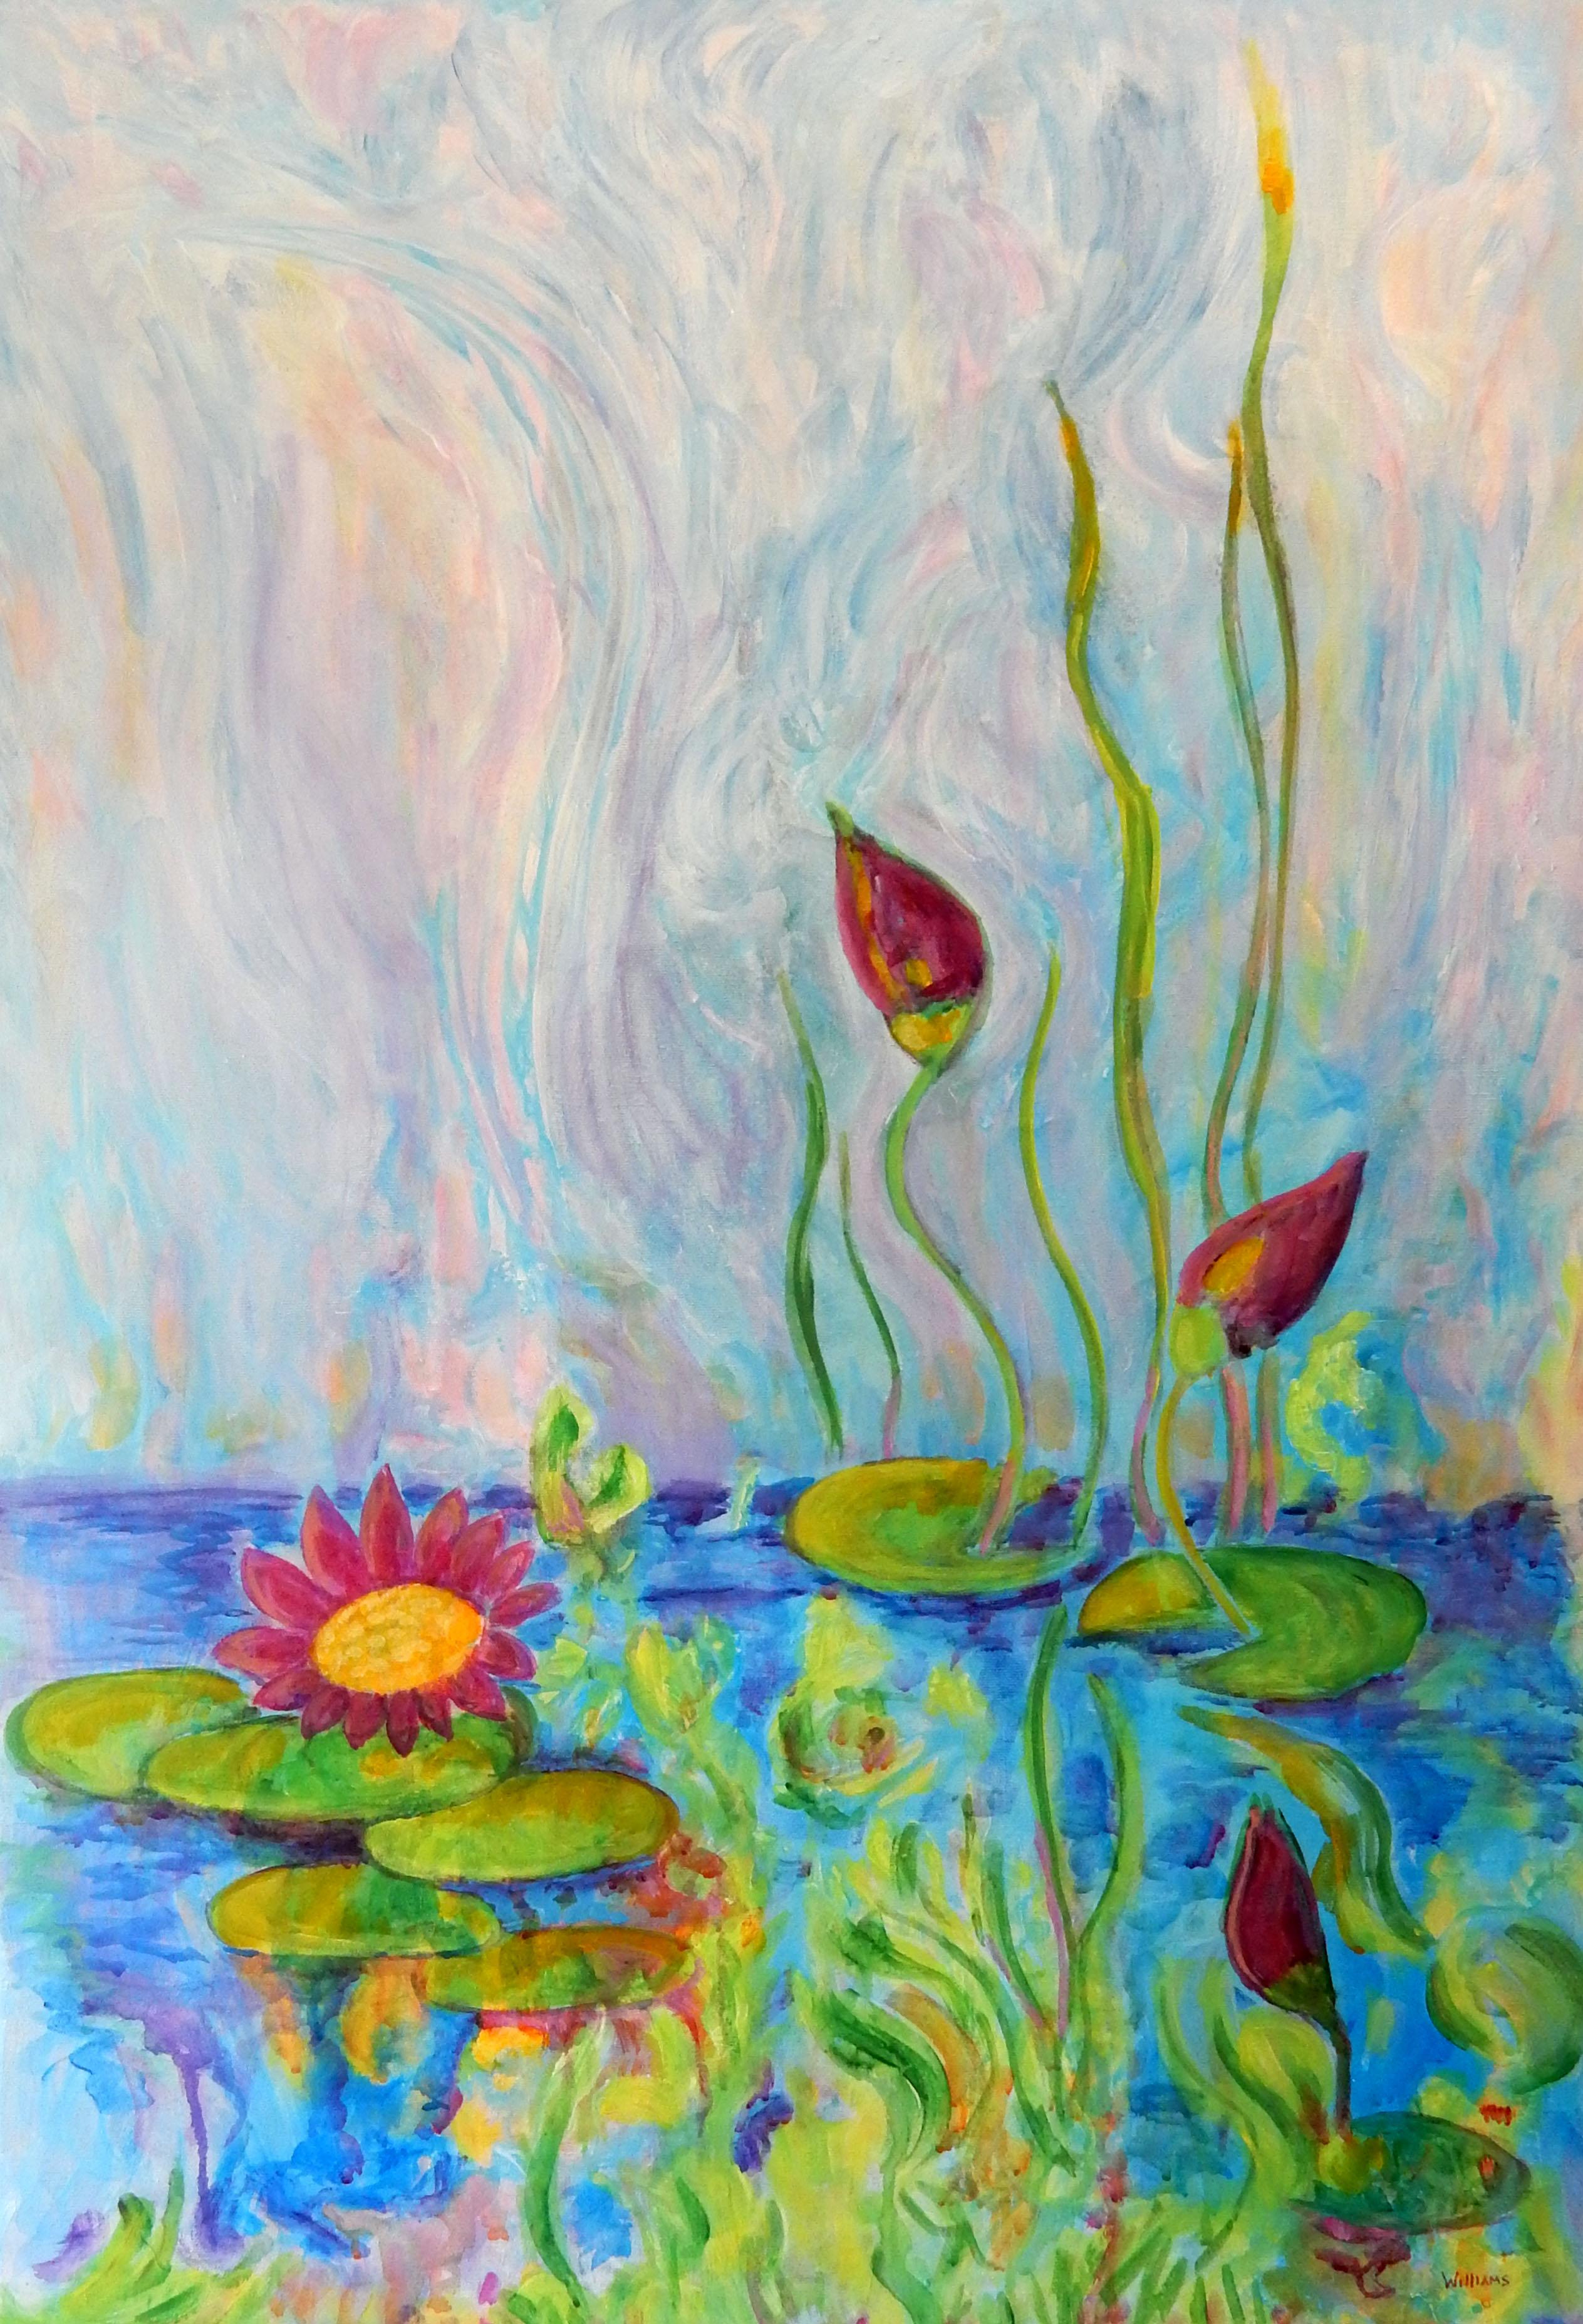 Magic of the Pond